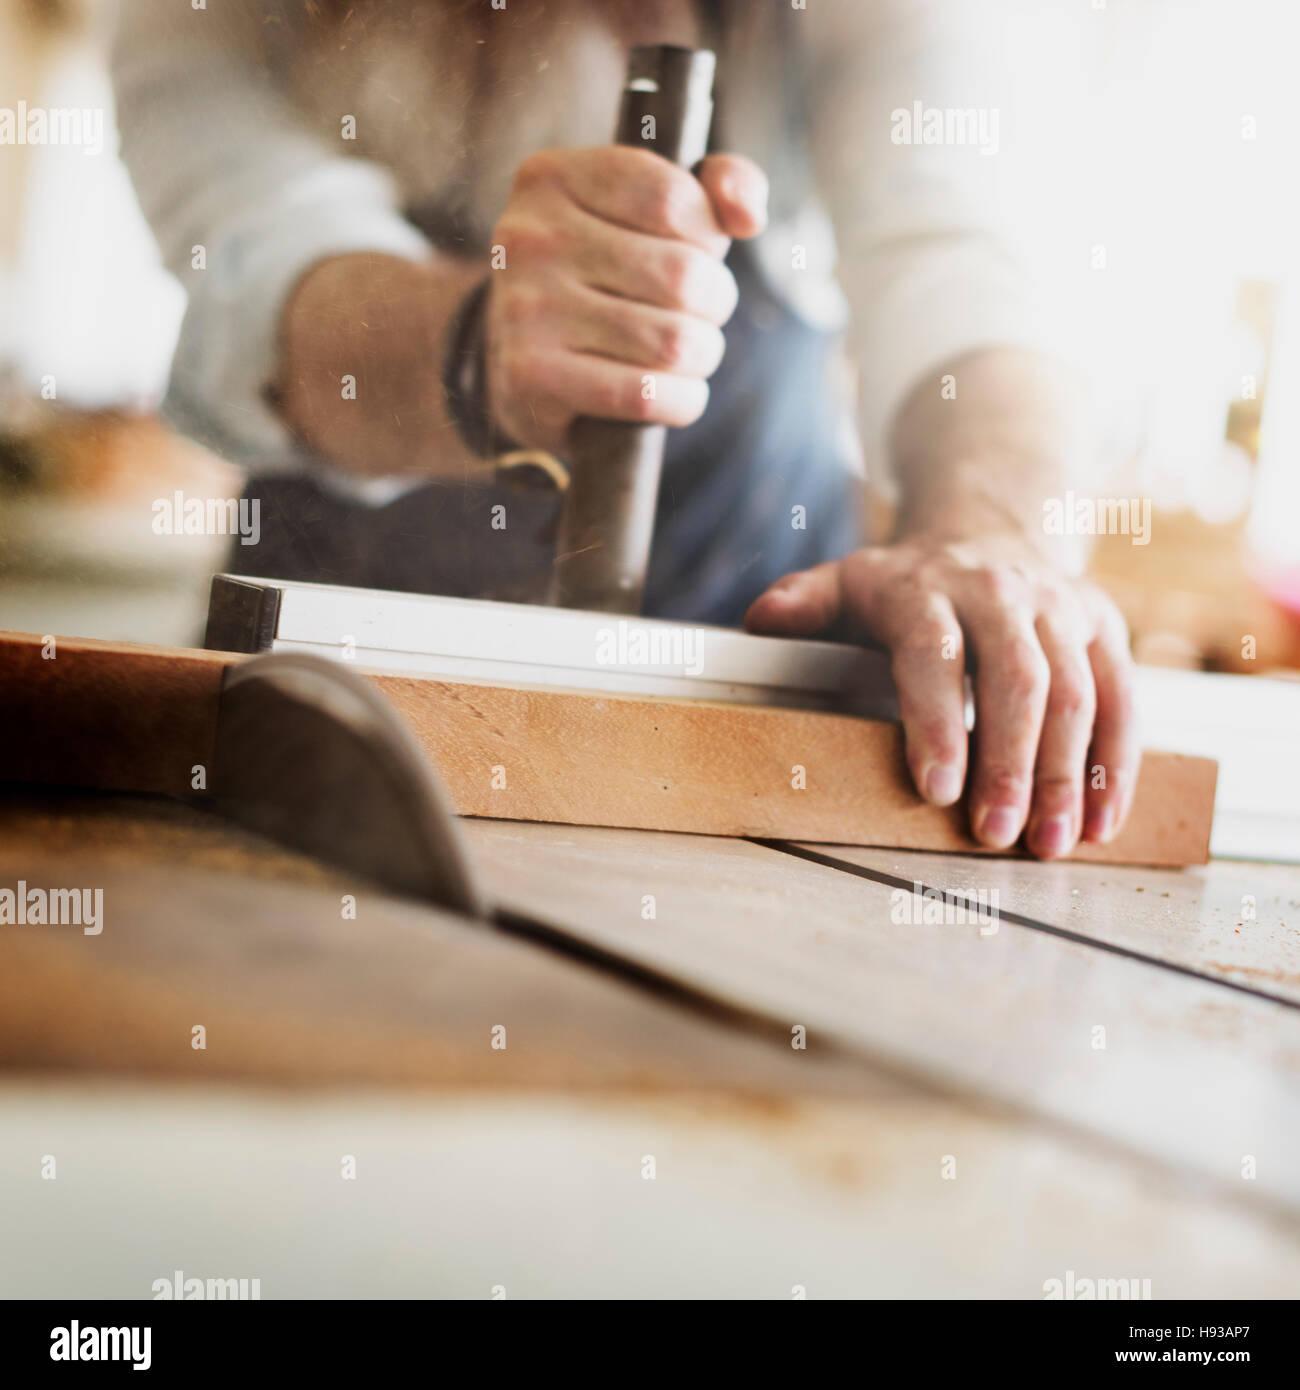 Craftsman Profession Occupation Pursuit Skilled Concept - Stock Image